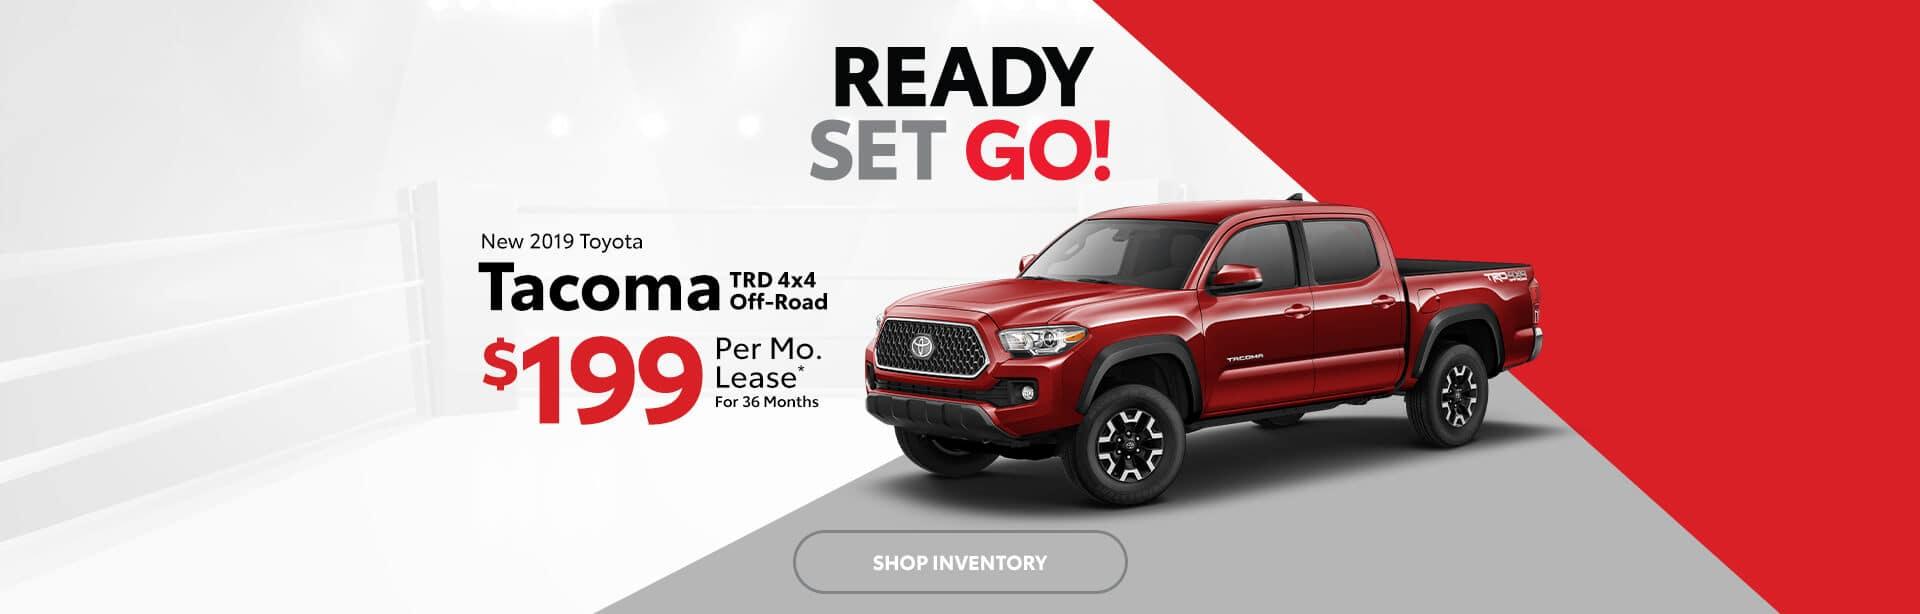 2019 Toyota Tacoma Best Deal near Indianapolis, Indiana